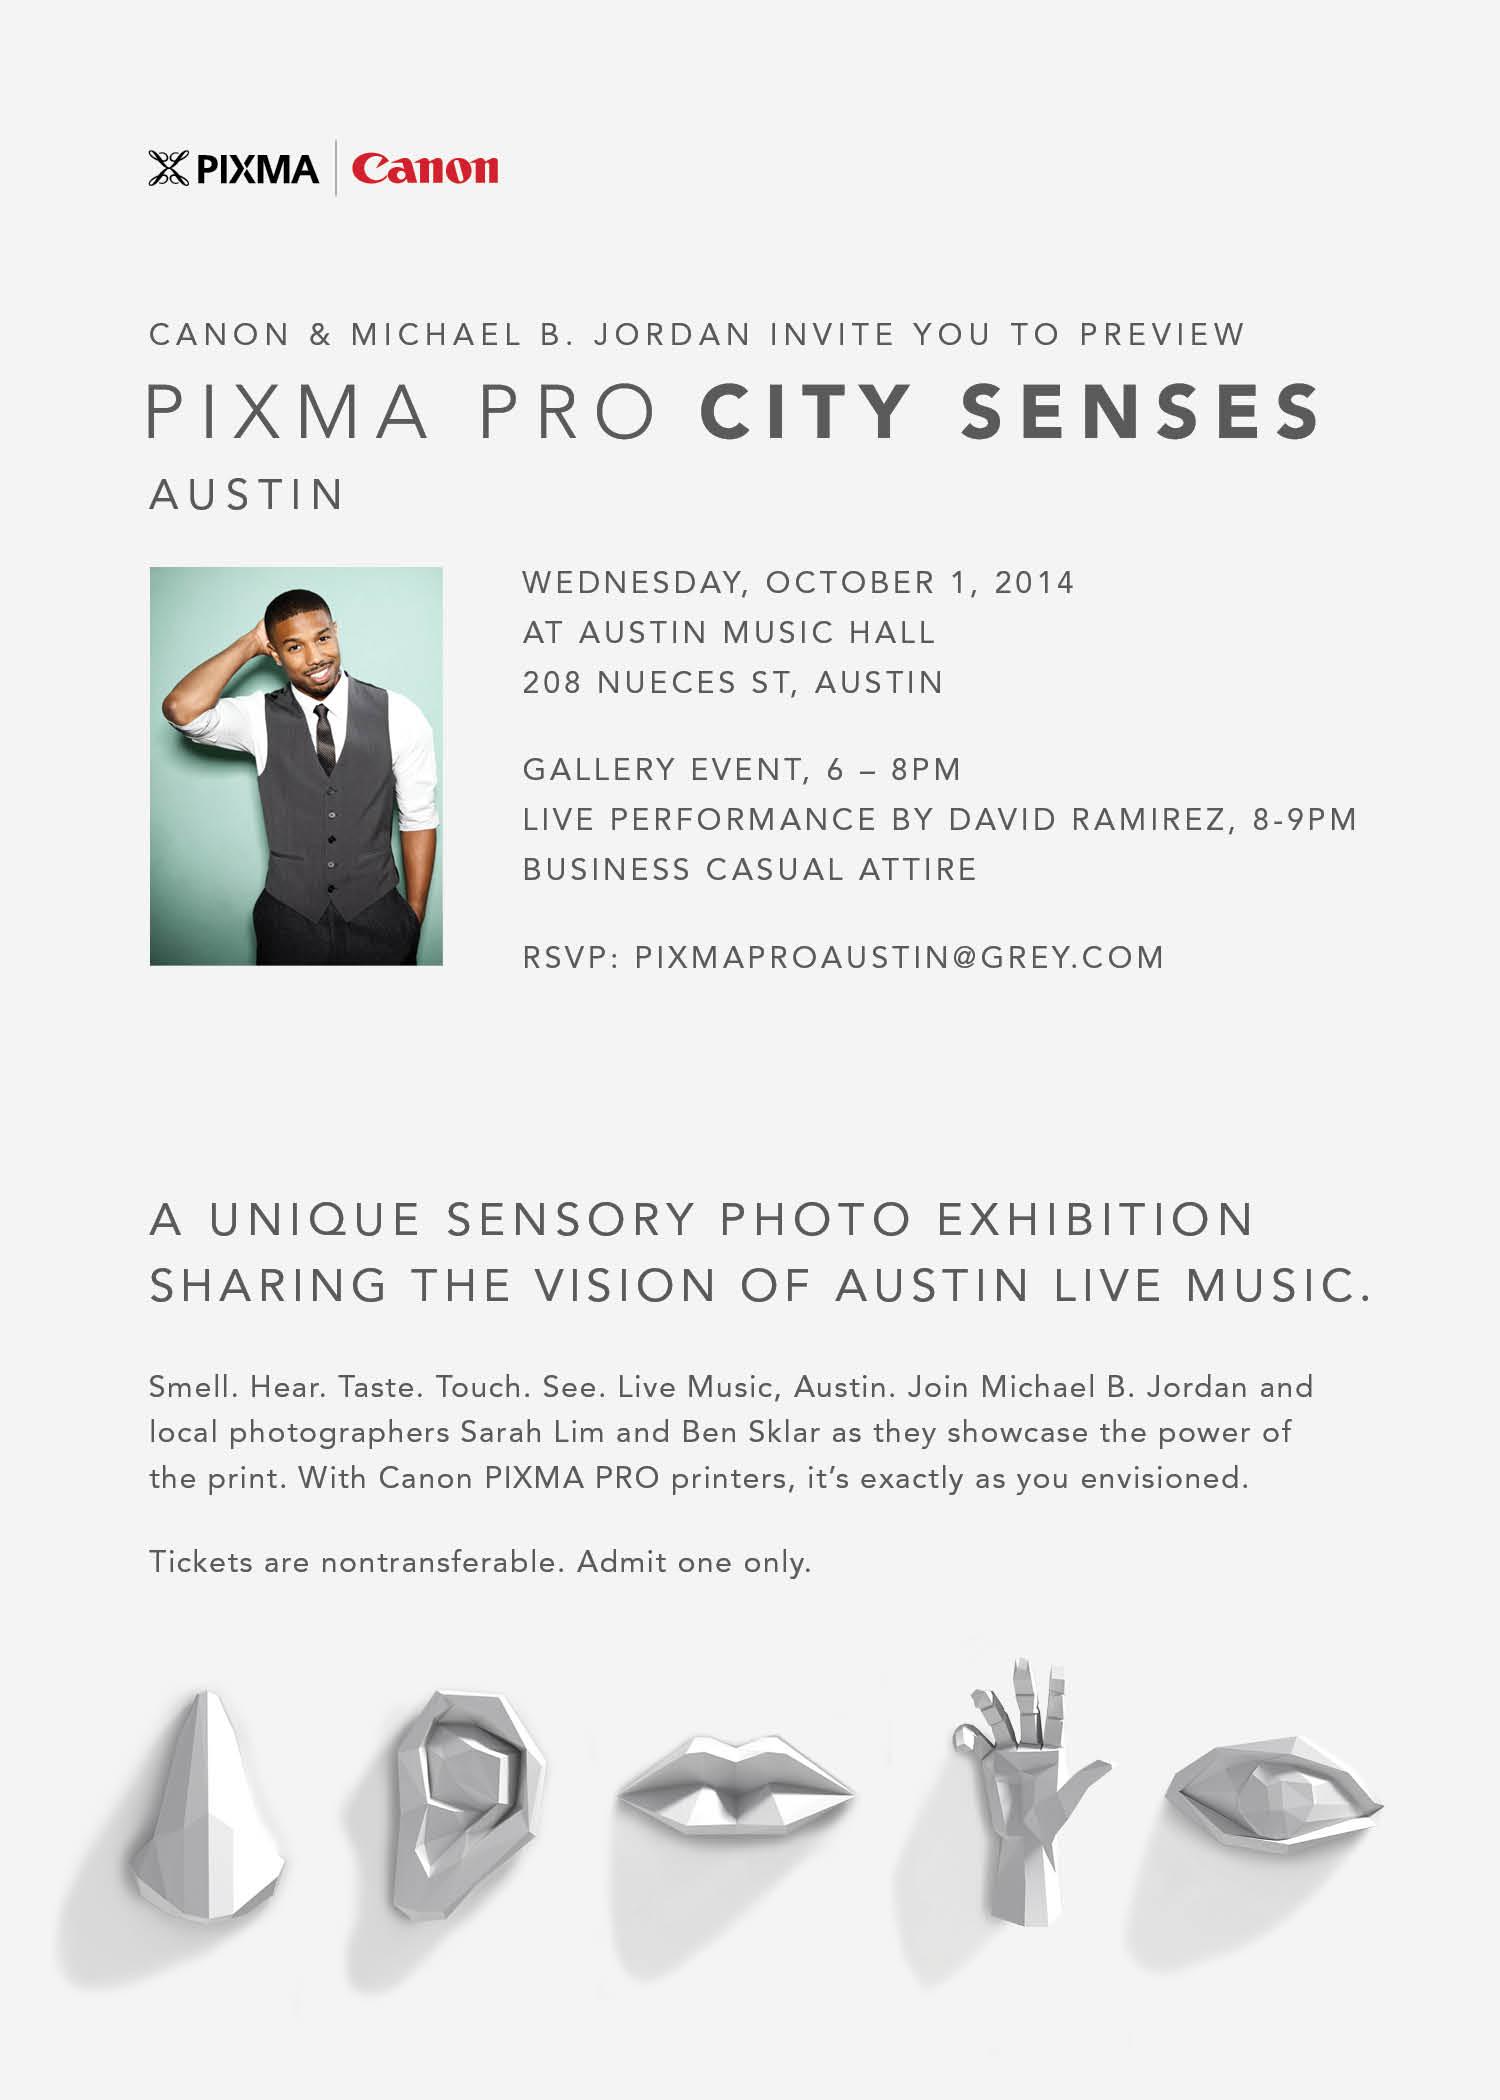 canon-pixma-pro-city-senses-gallery-event-in-austin-tx-on-10114_15746331969_o.jpg